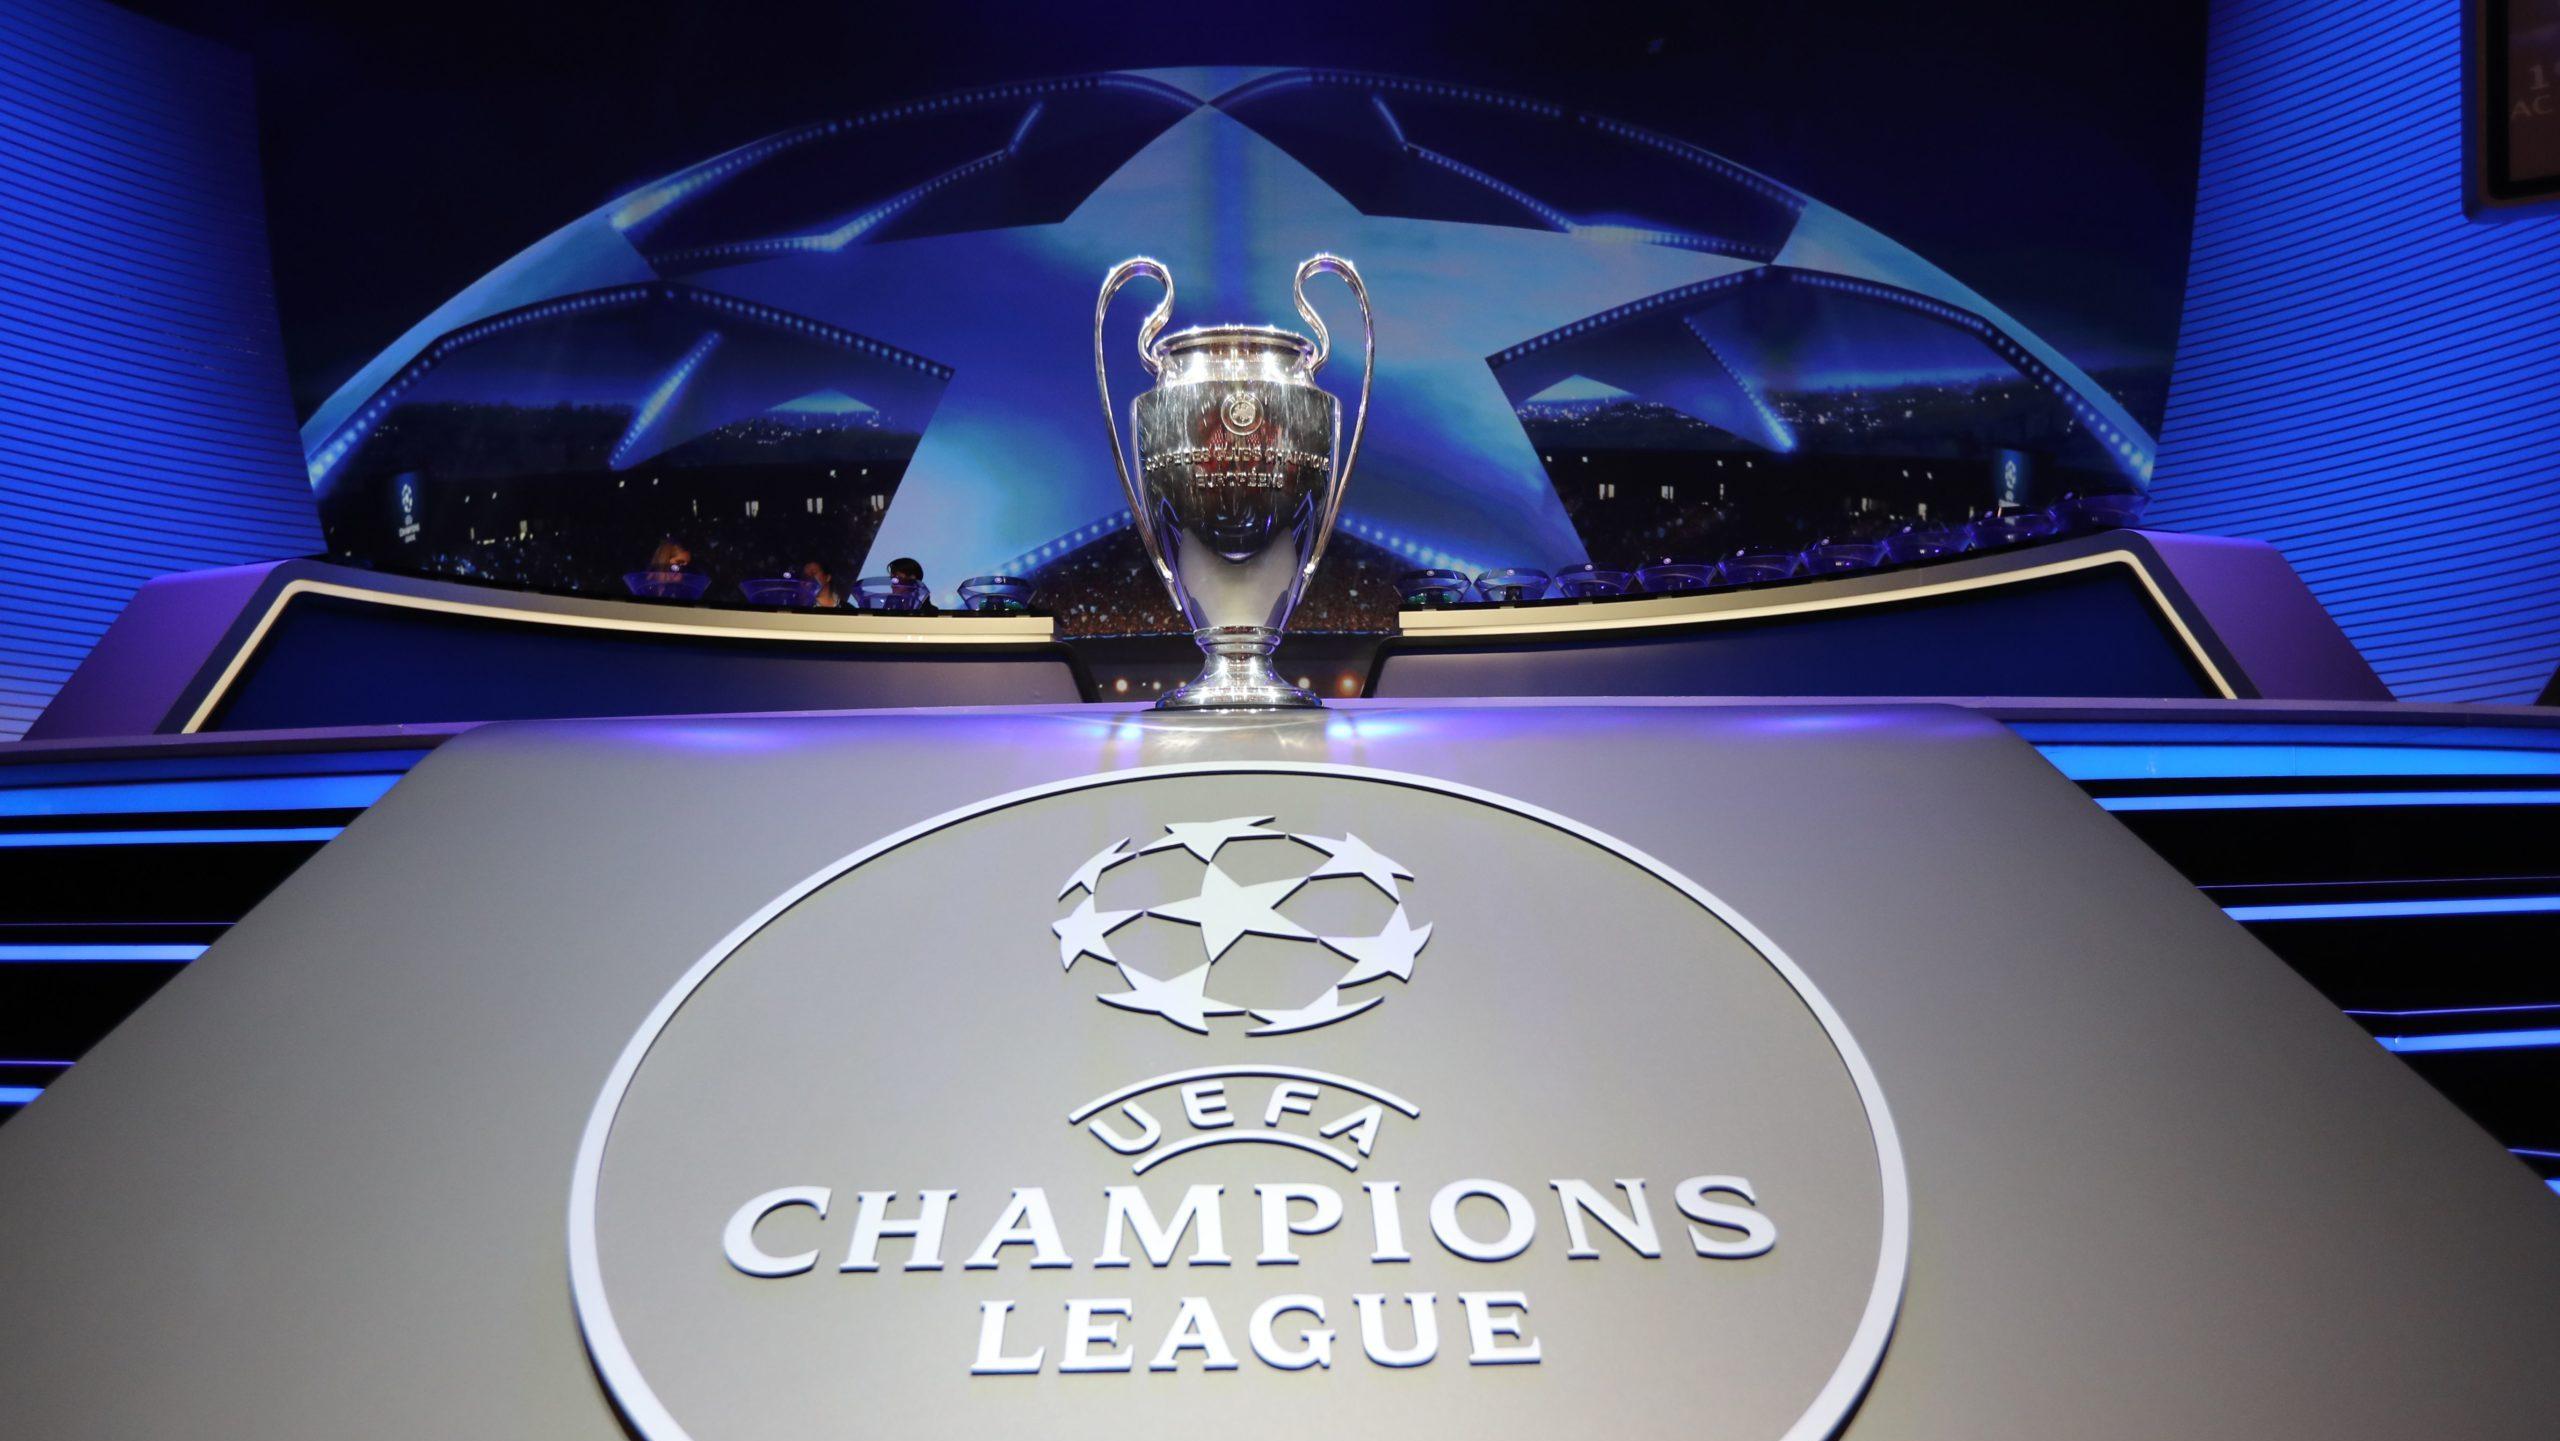 Bundesliga 2019 20 Uefa Champions League And Europa League Final Tournaments Explained